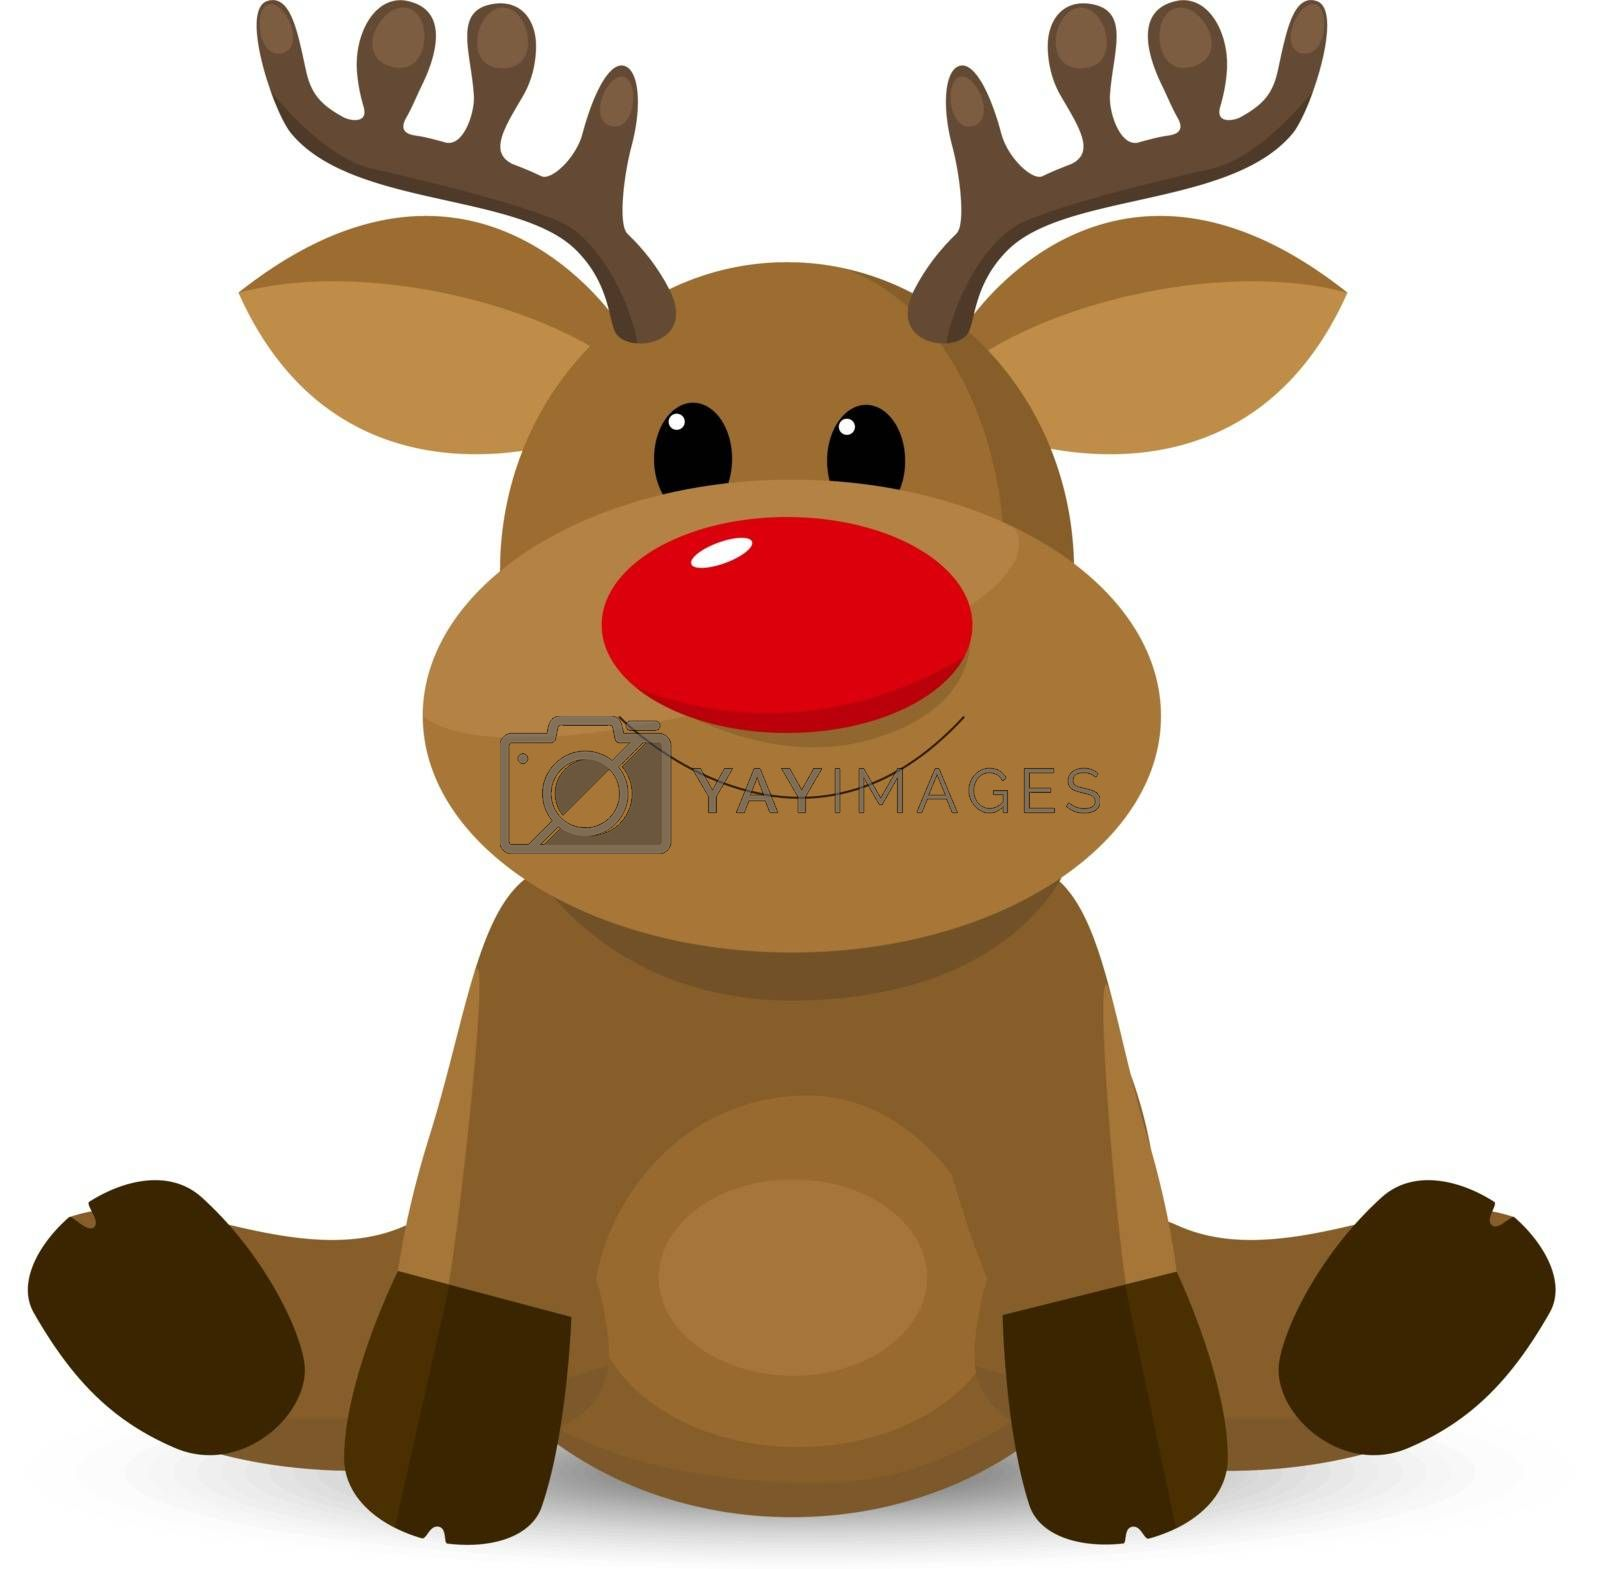 Cute little reindeer by liolle